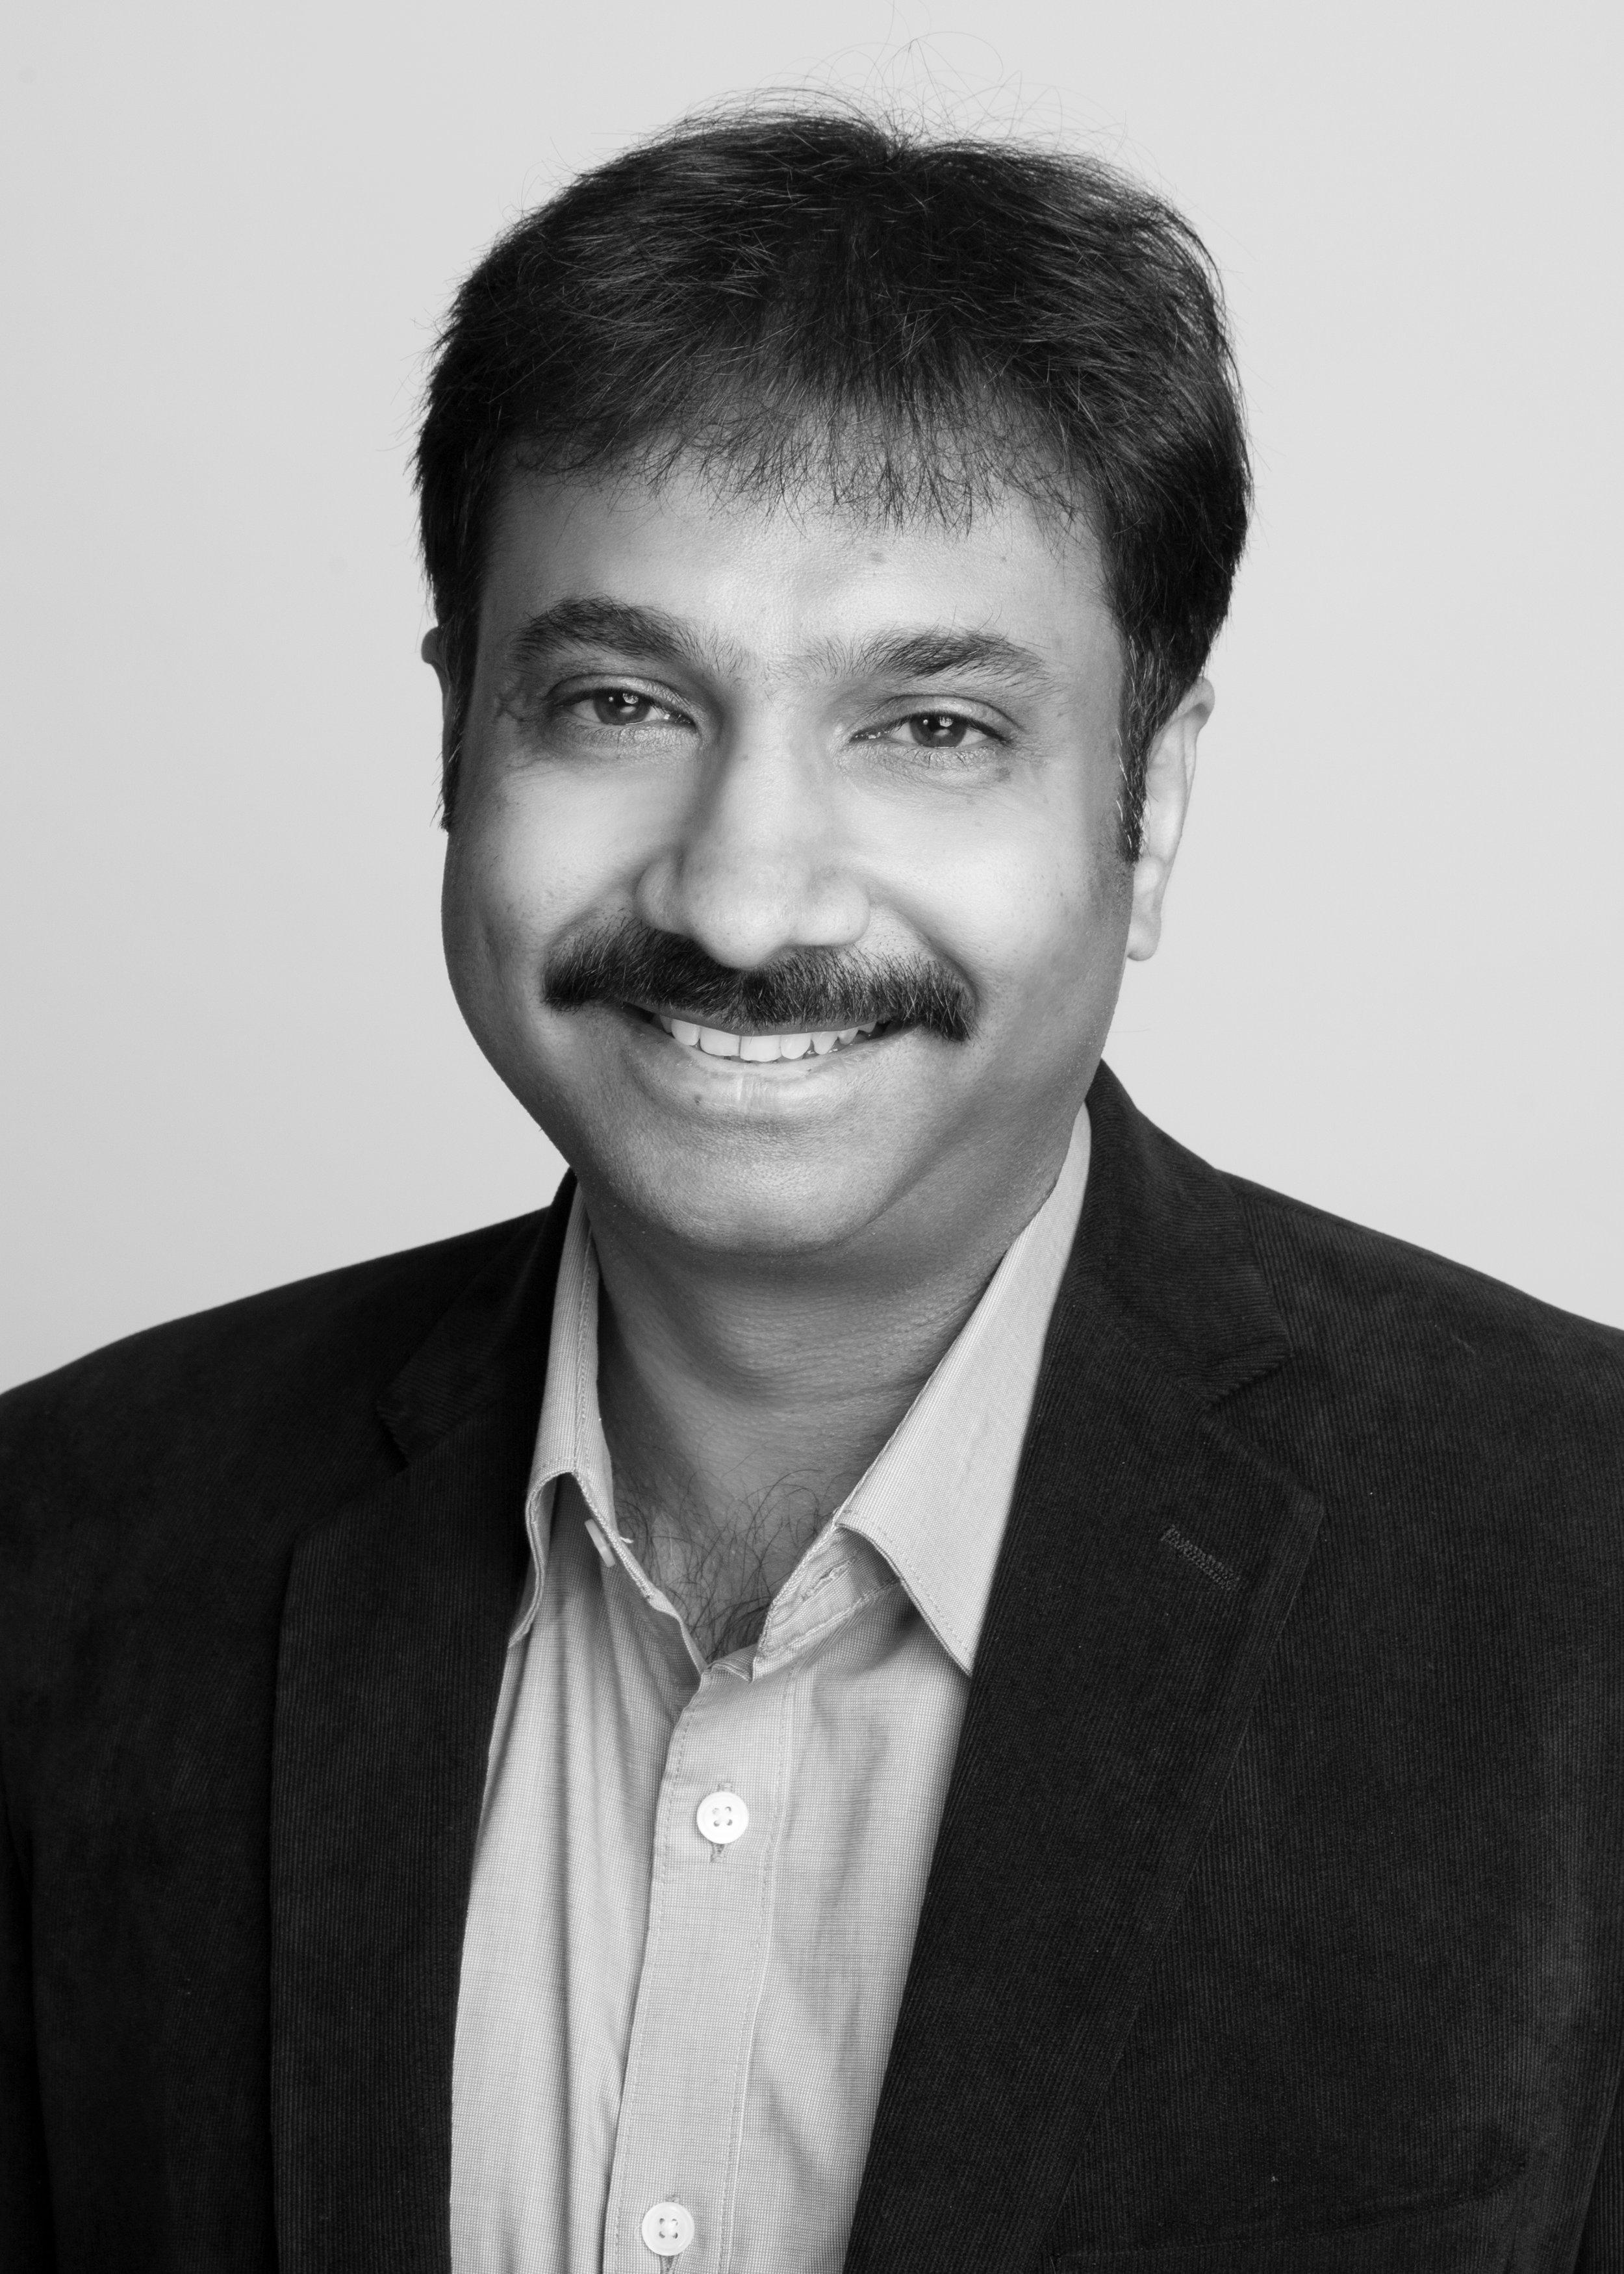 Reltio Manish Jain